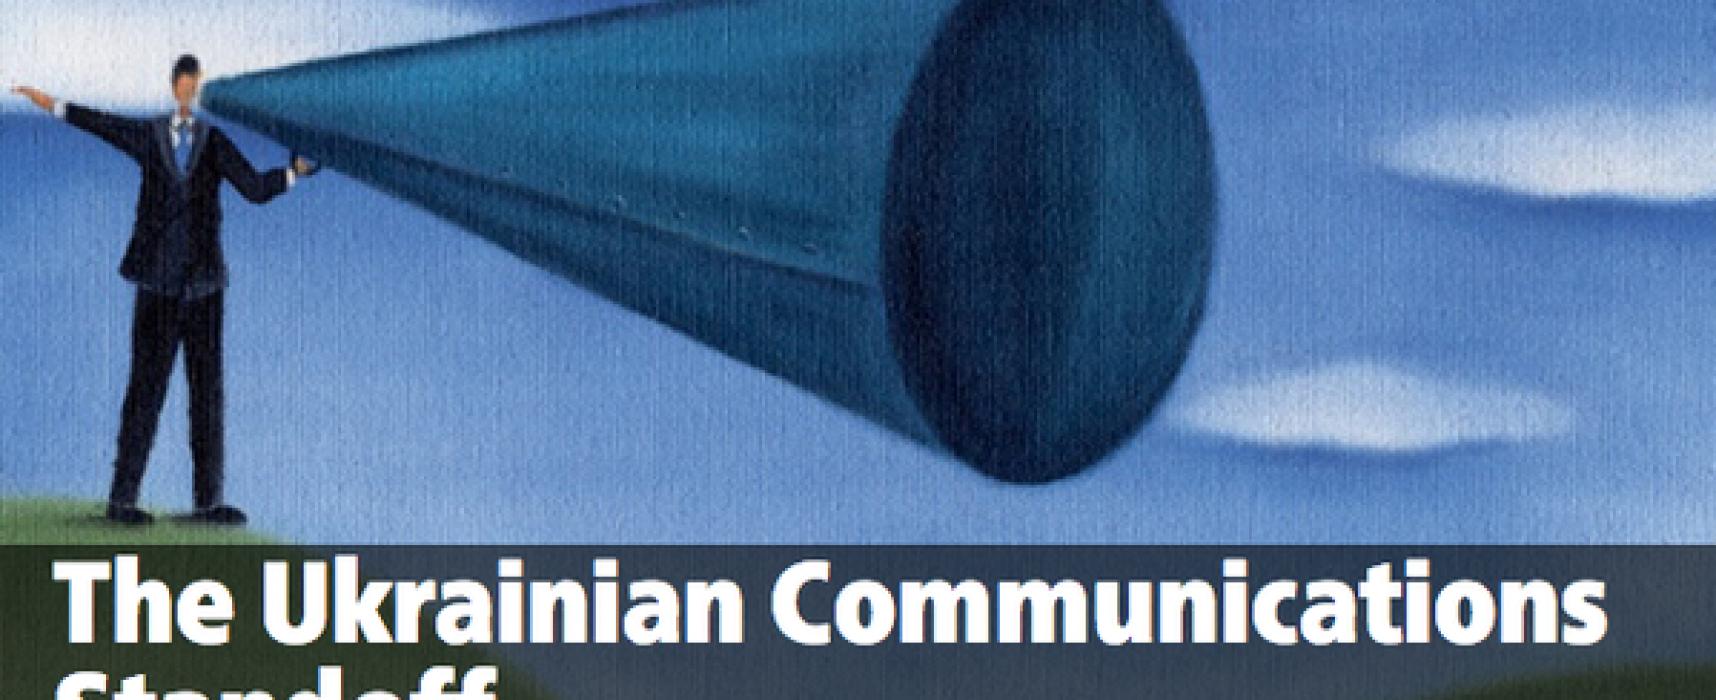 The Ukrainian Communications Standoff